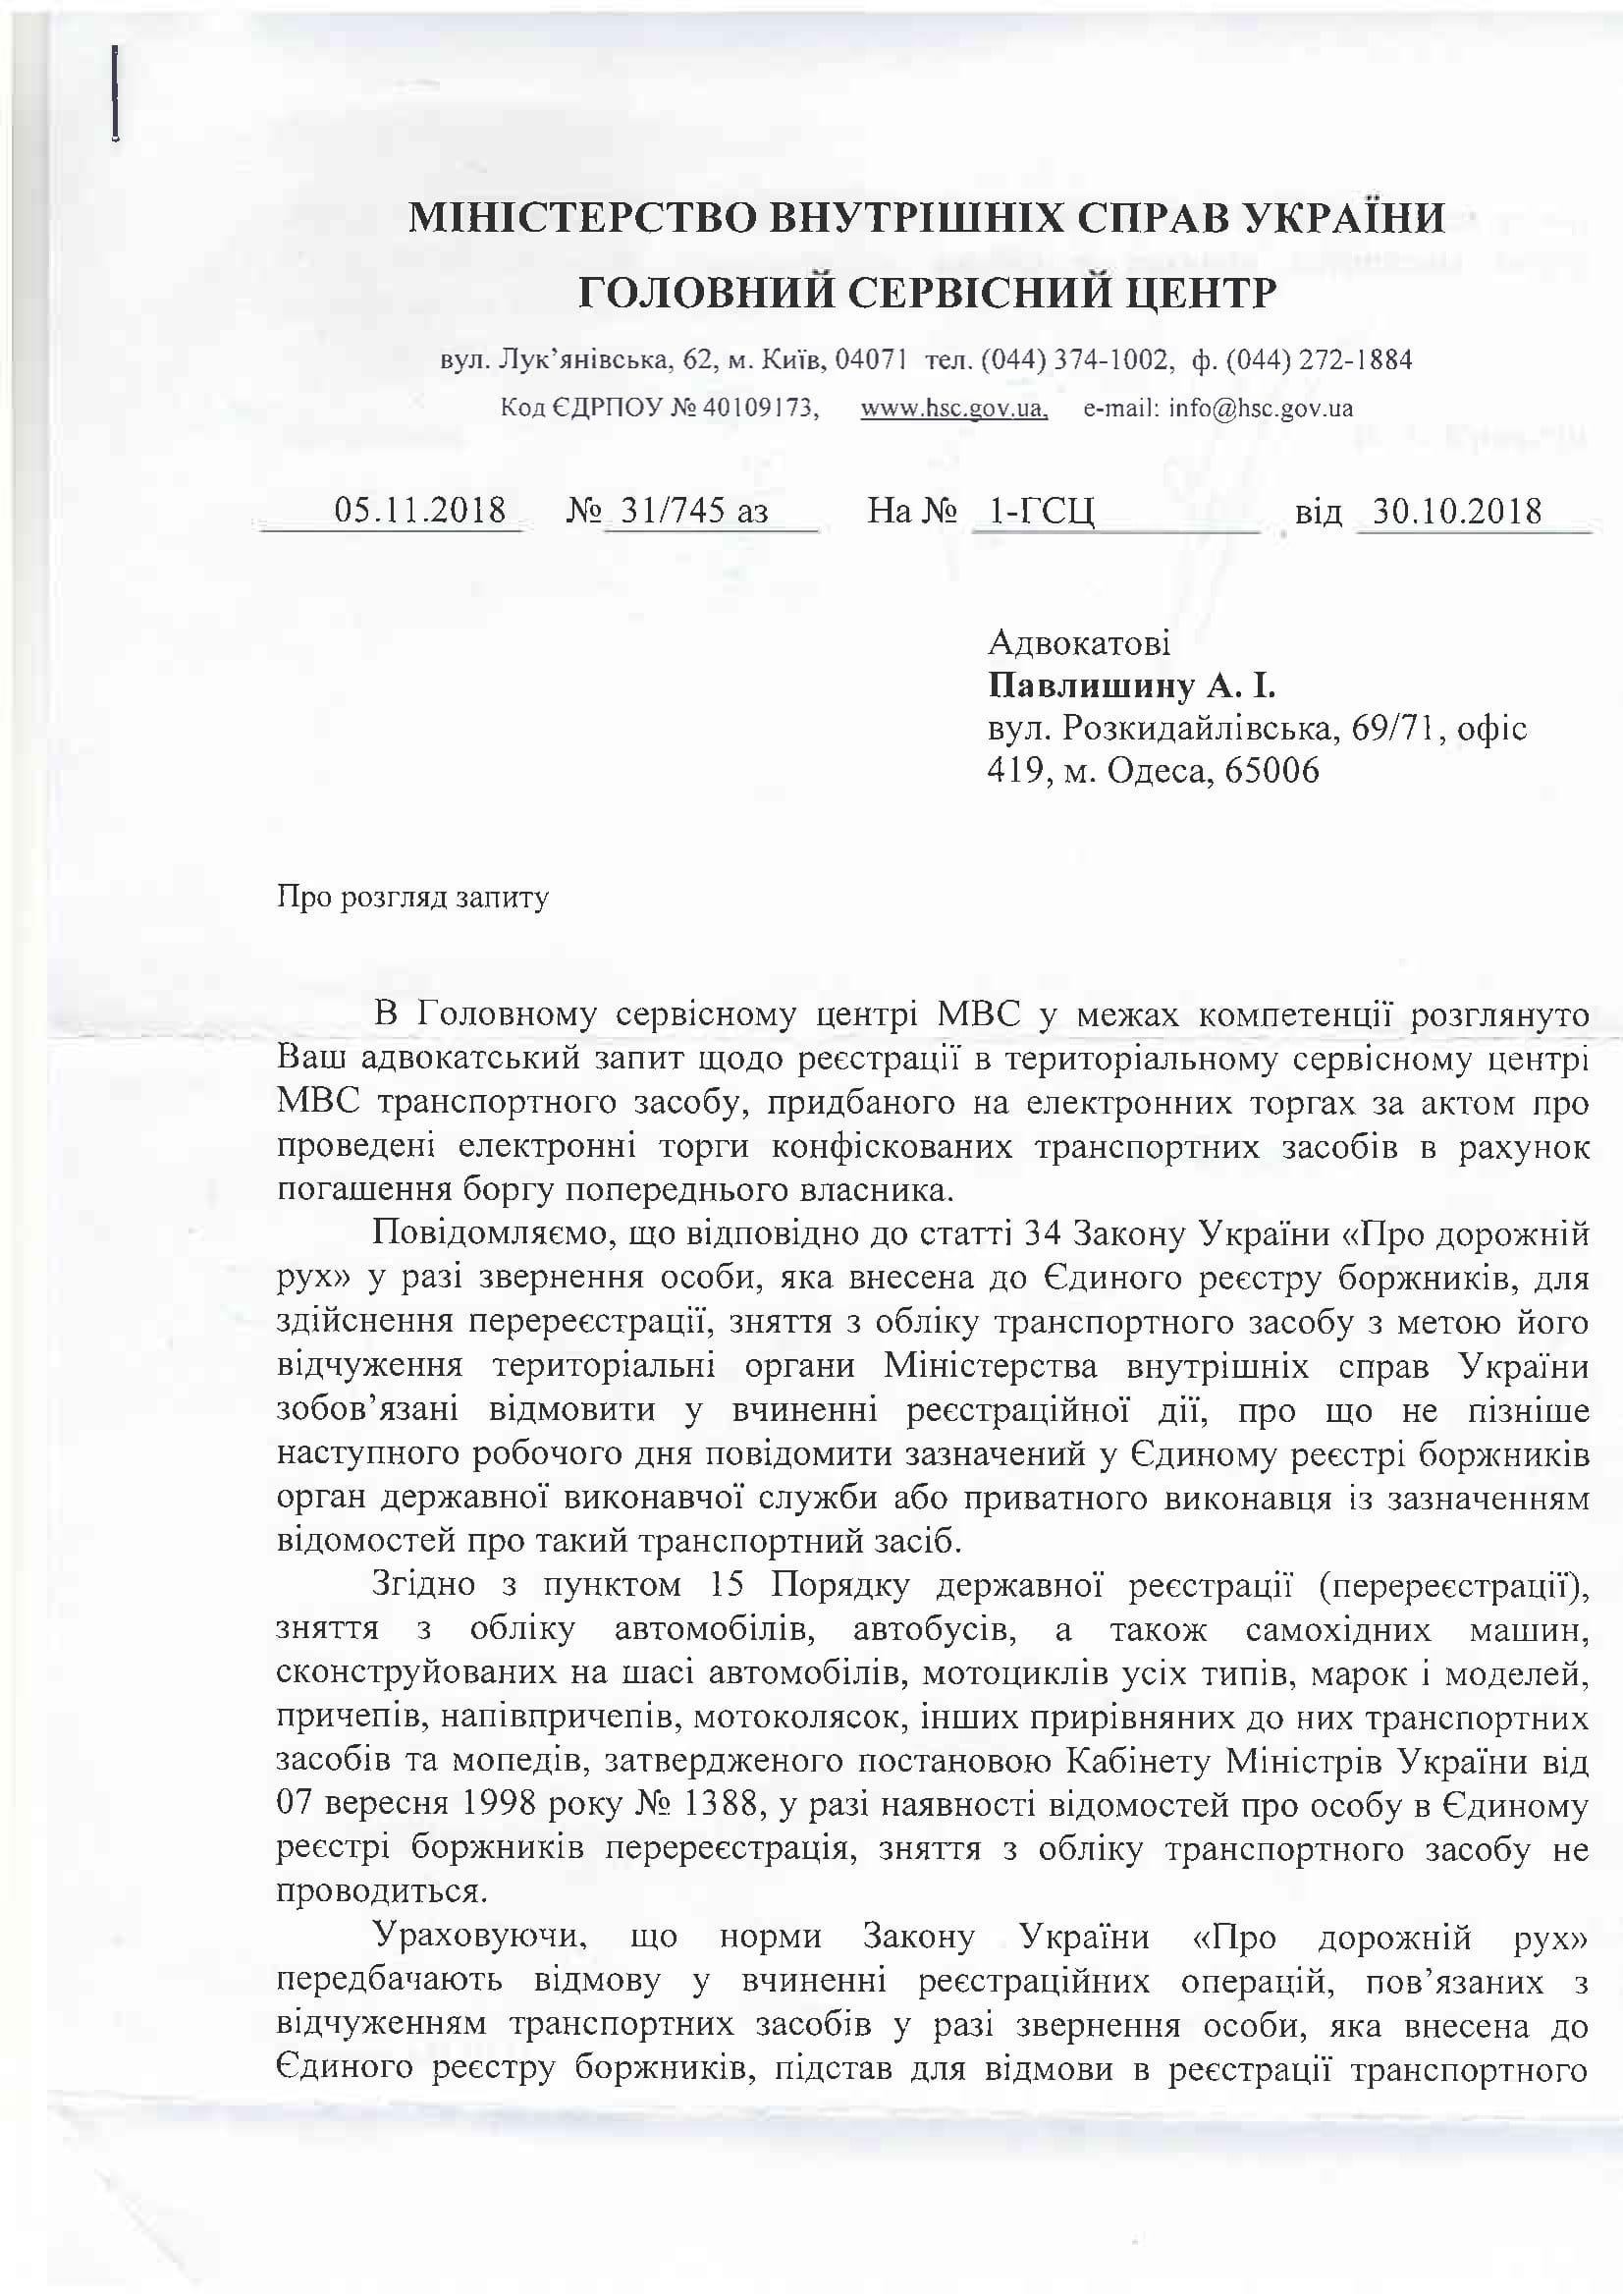 image http://forum.setam.net.ua/assets/images/79-cPkWCOJy2HnMHzlo.jpeg